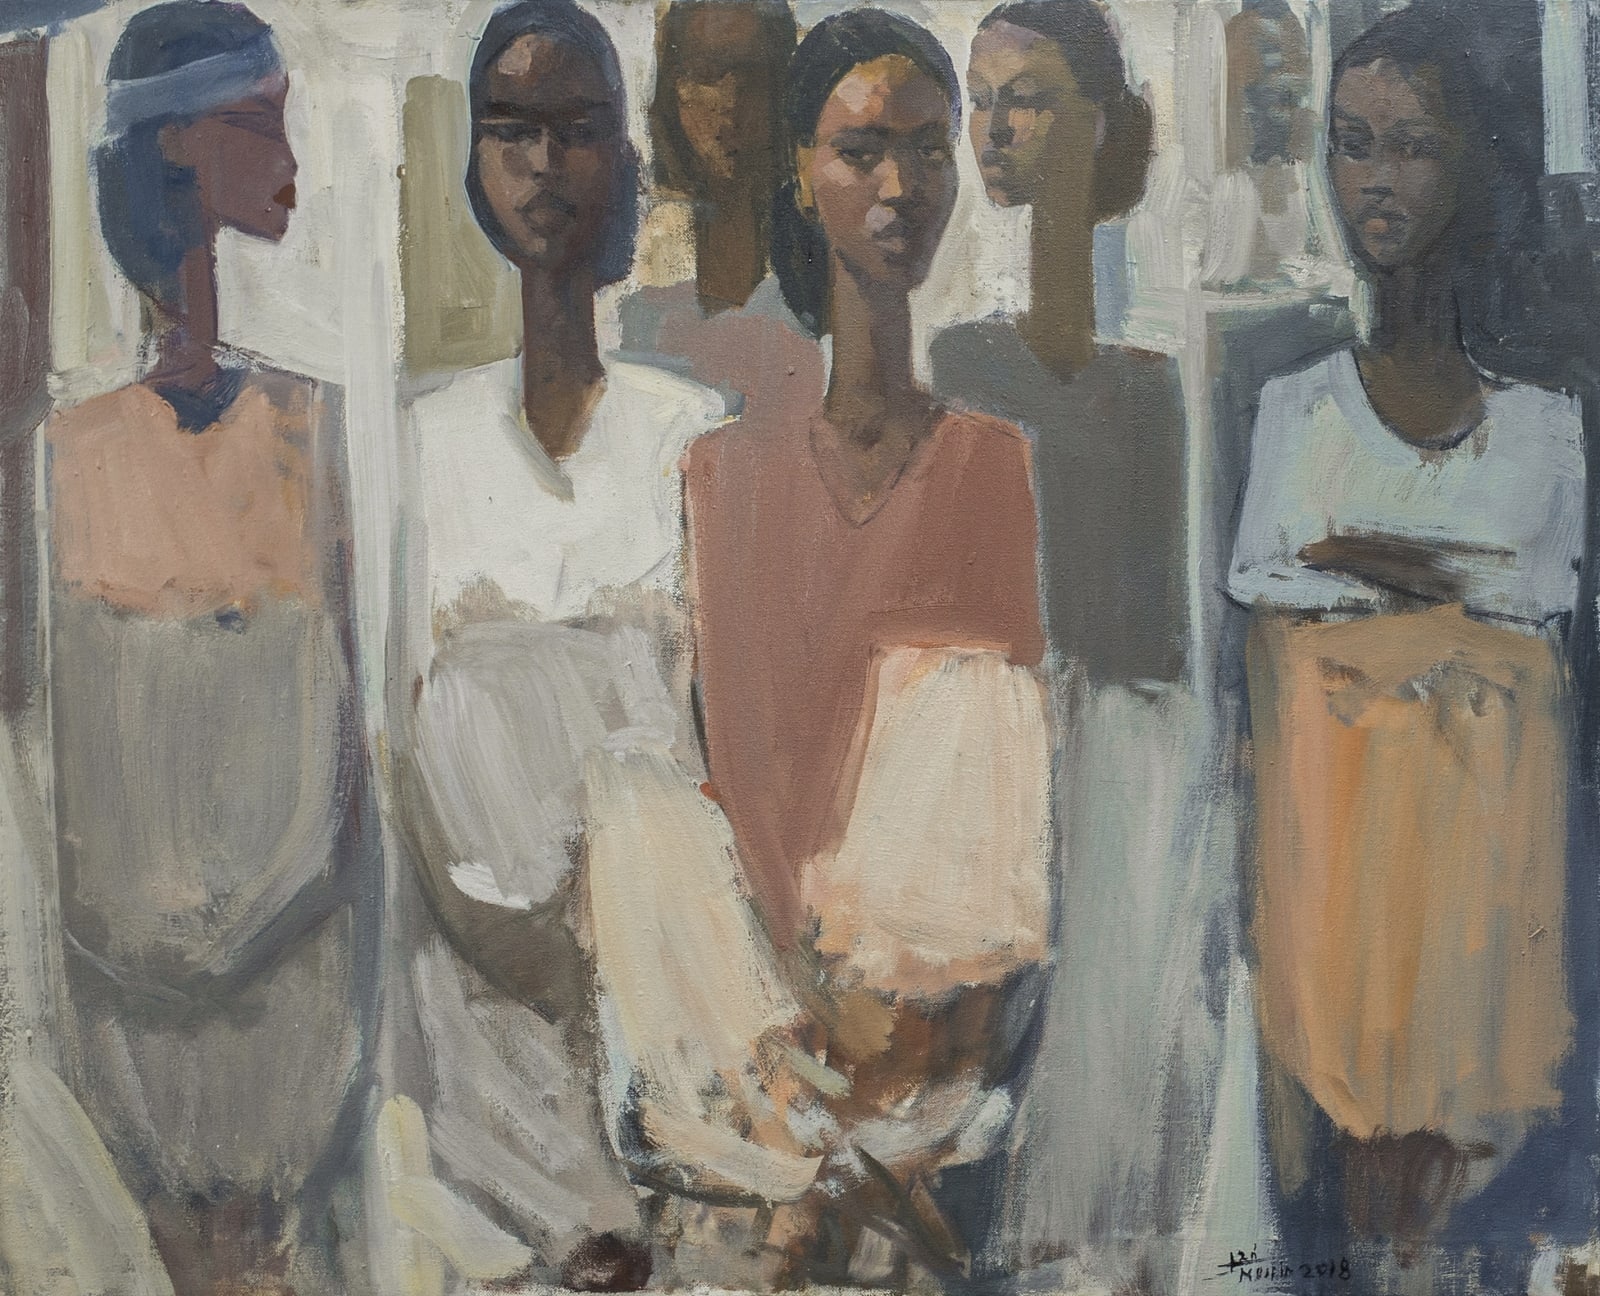 Tadesse Mesfin, Pillars of Life: Hope II, 2018. Courtesy of the Artist and Addis Fine Art